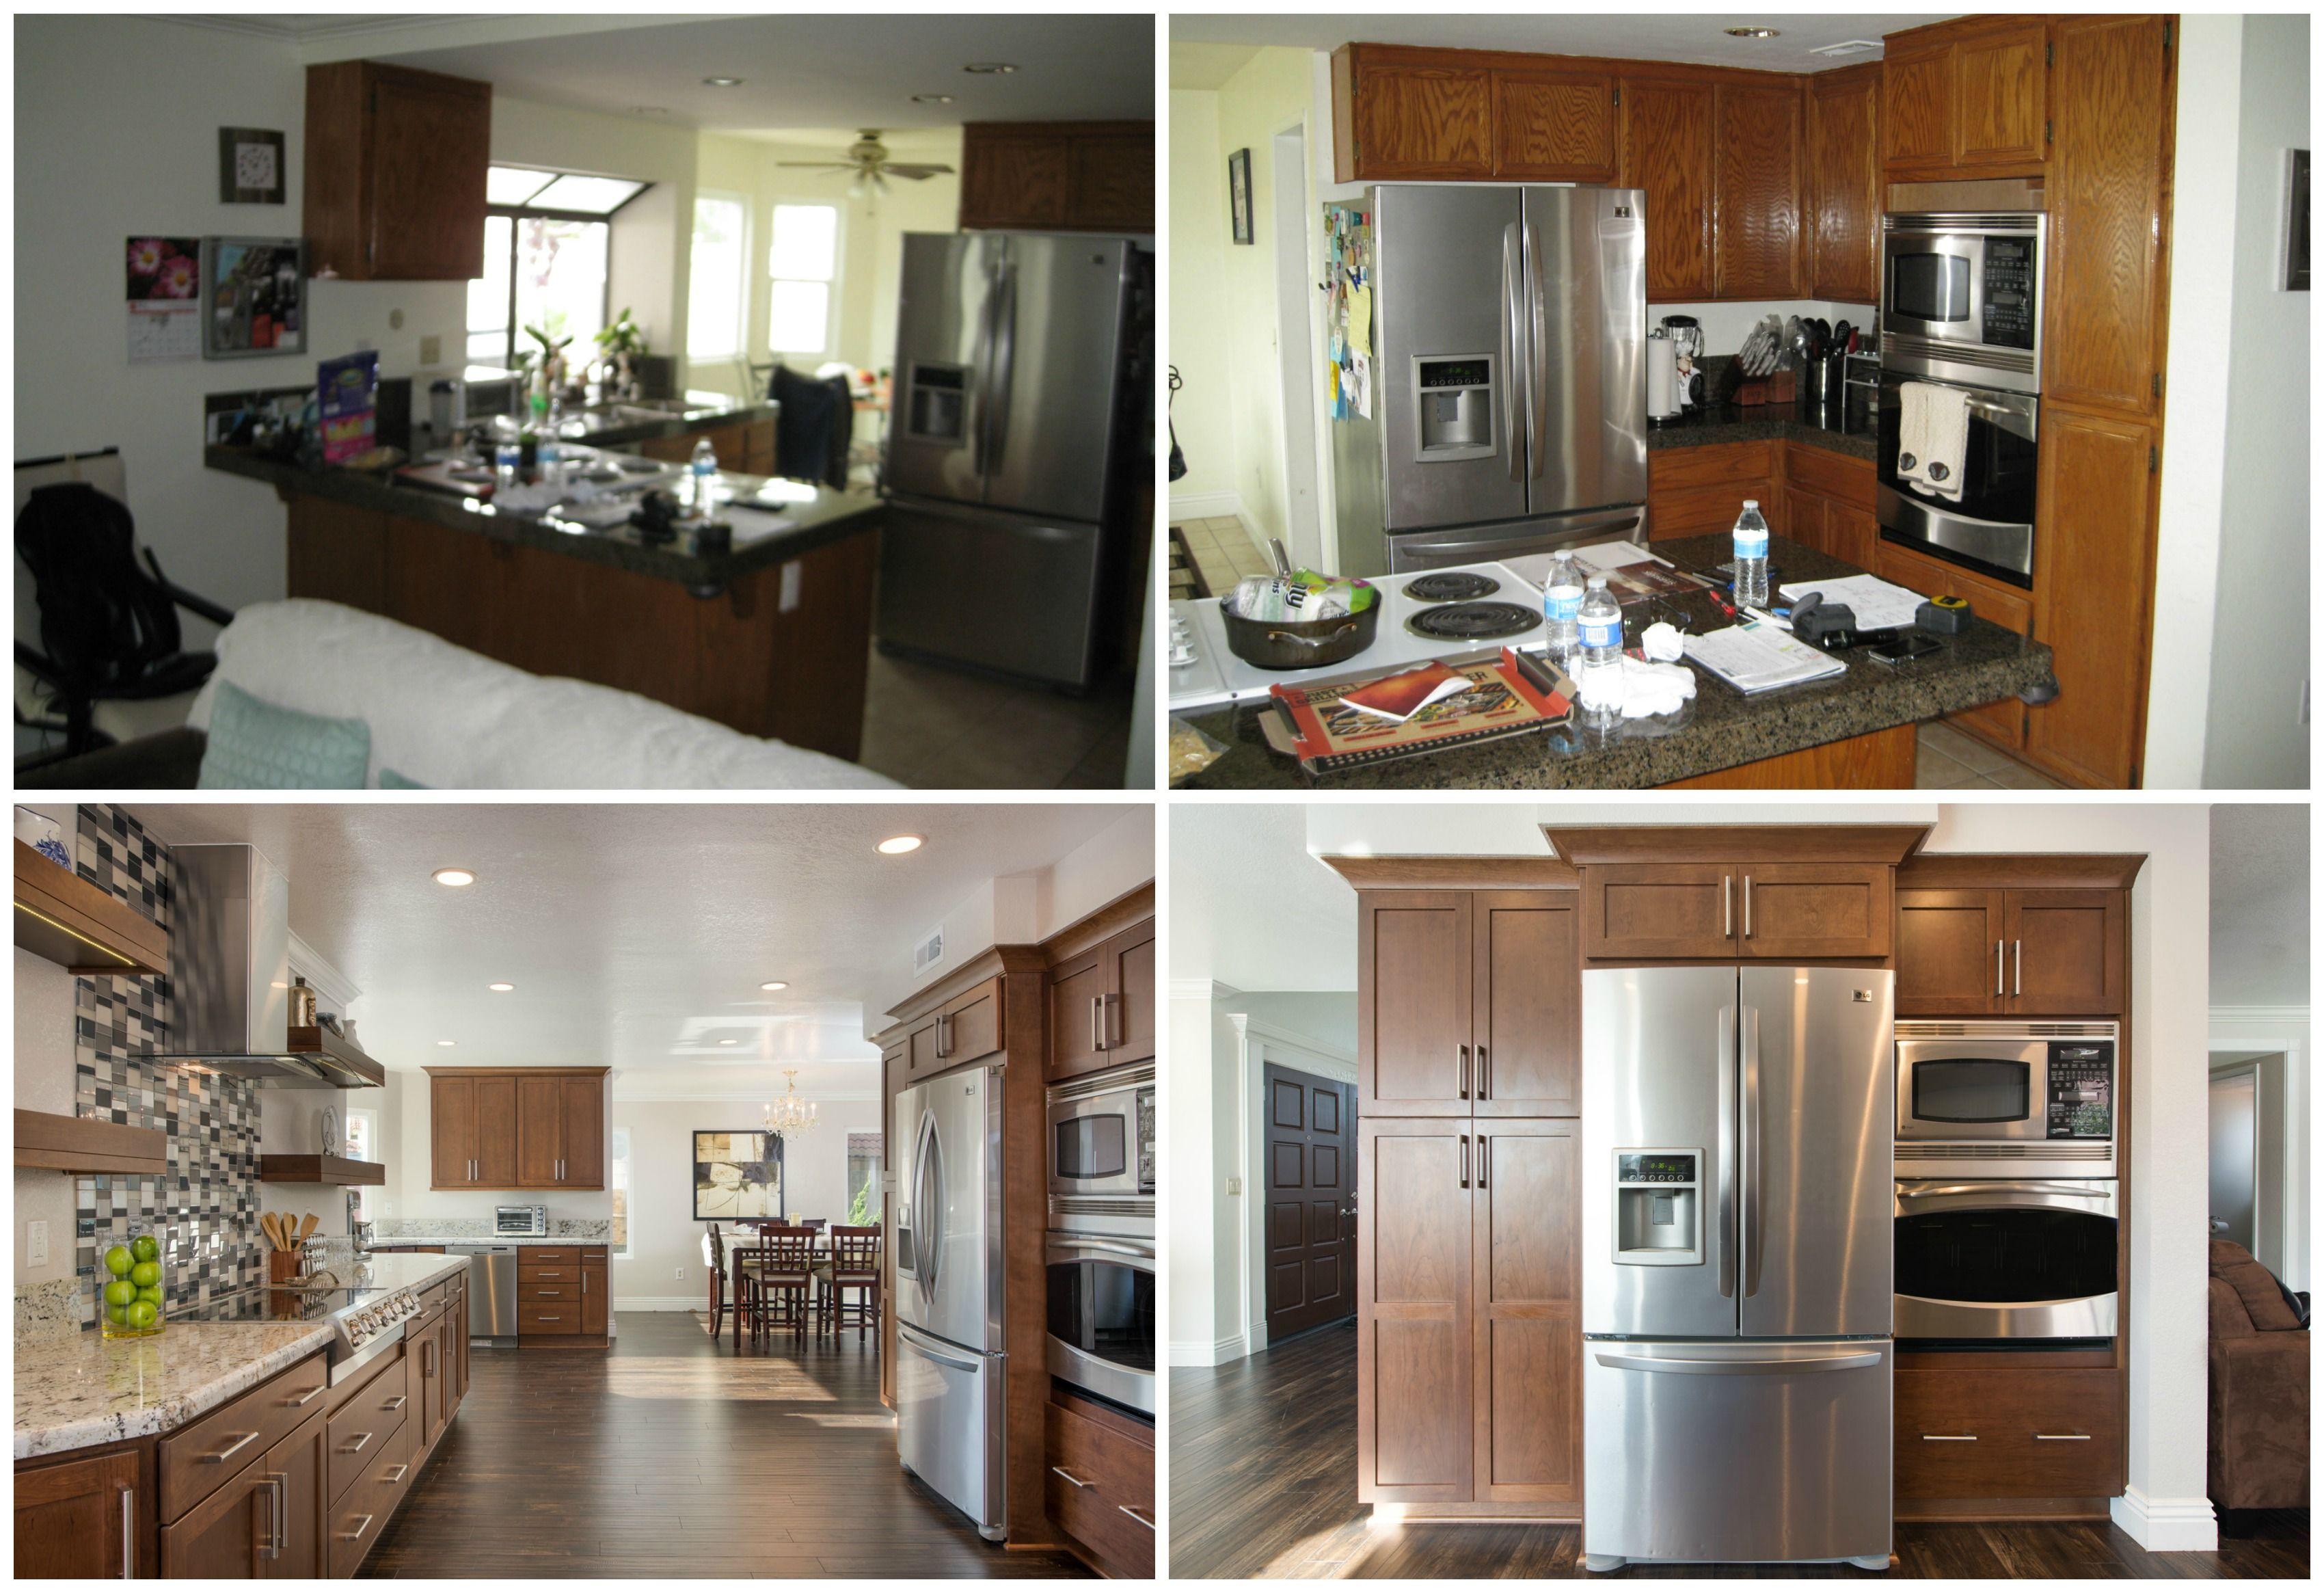 46+ San diego kitchen remodeling ideas